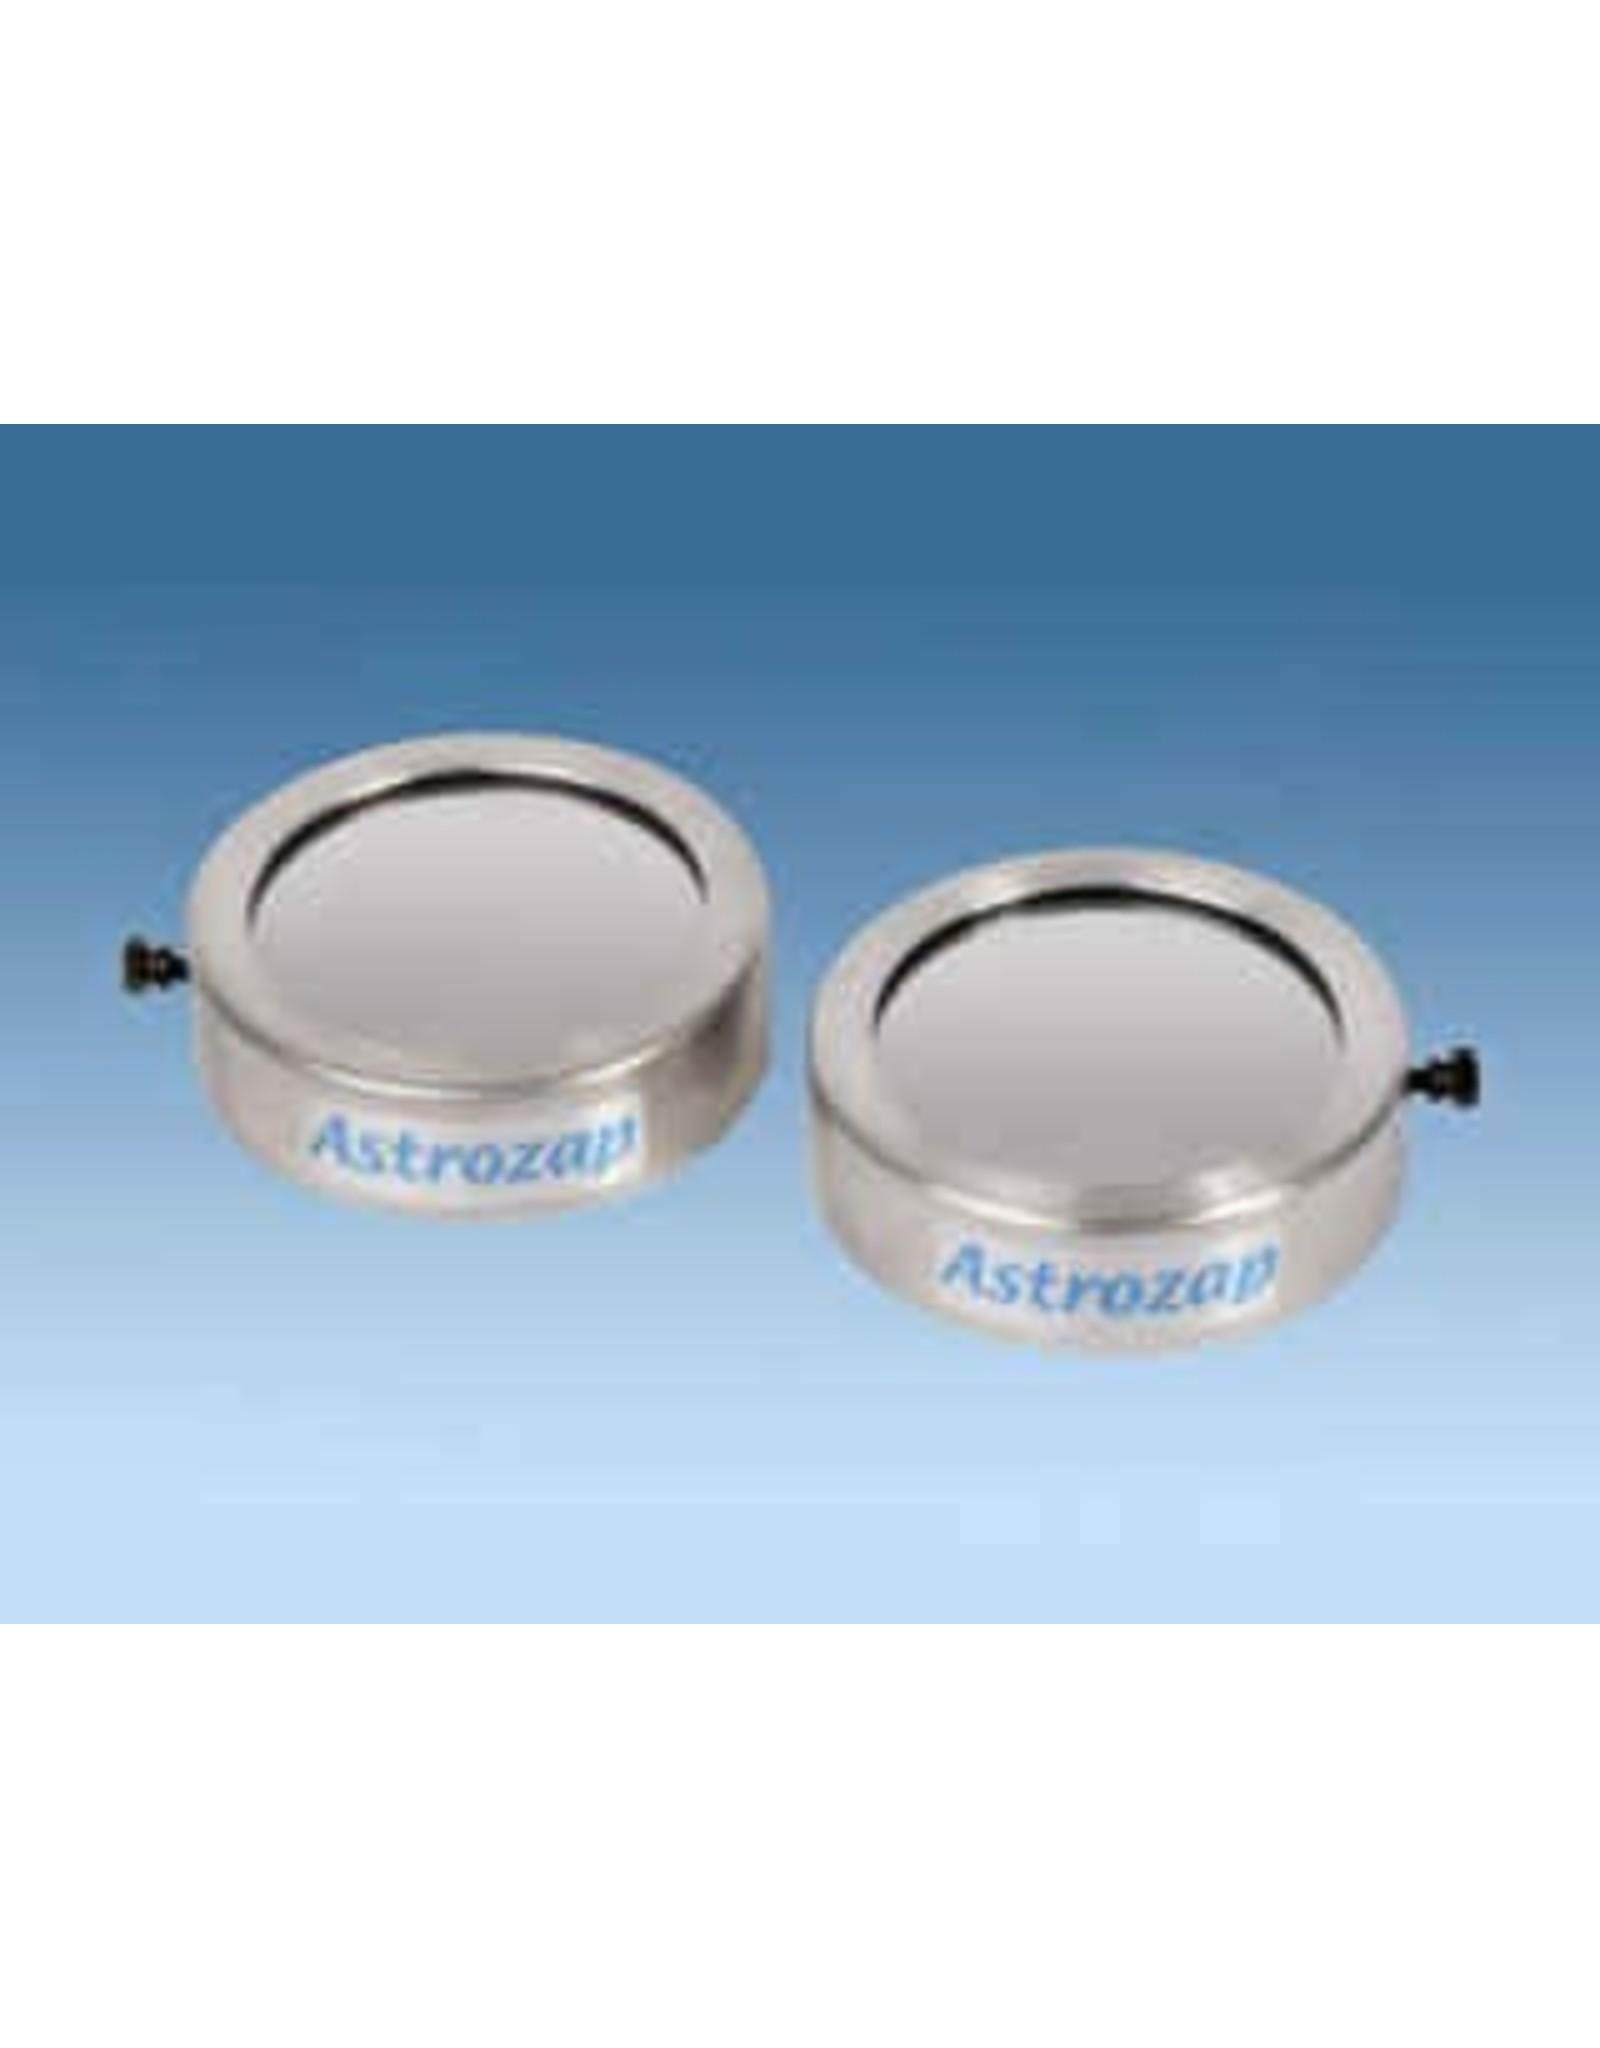 Astrozap AZ-1573 Glass Solar Filter - Binocular - 60mm-67mm